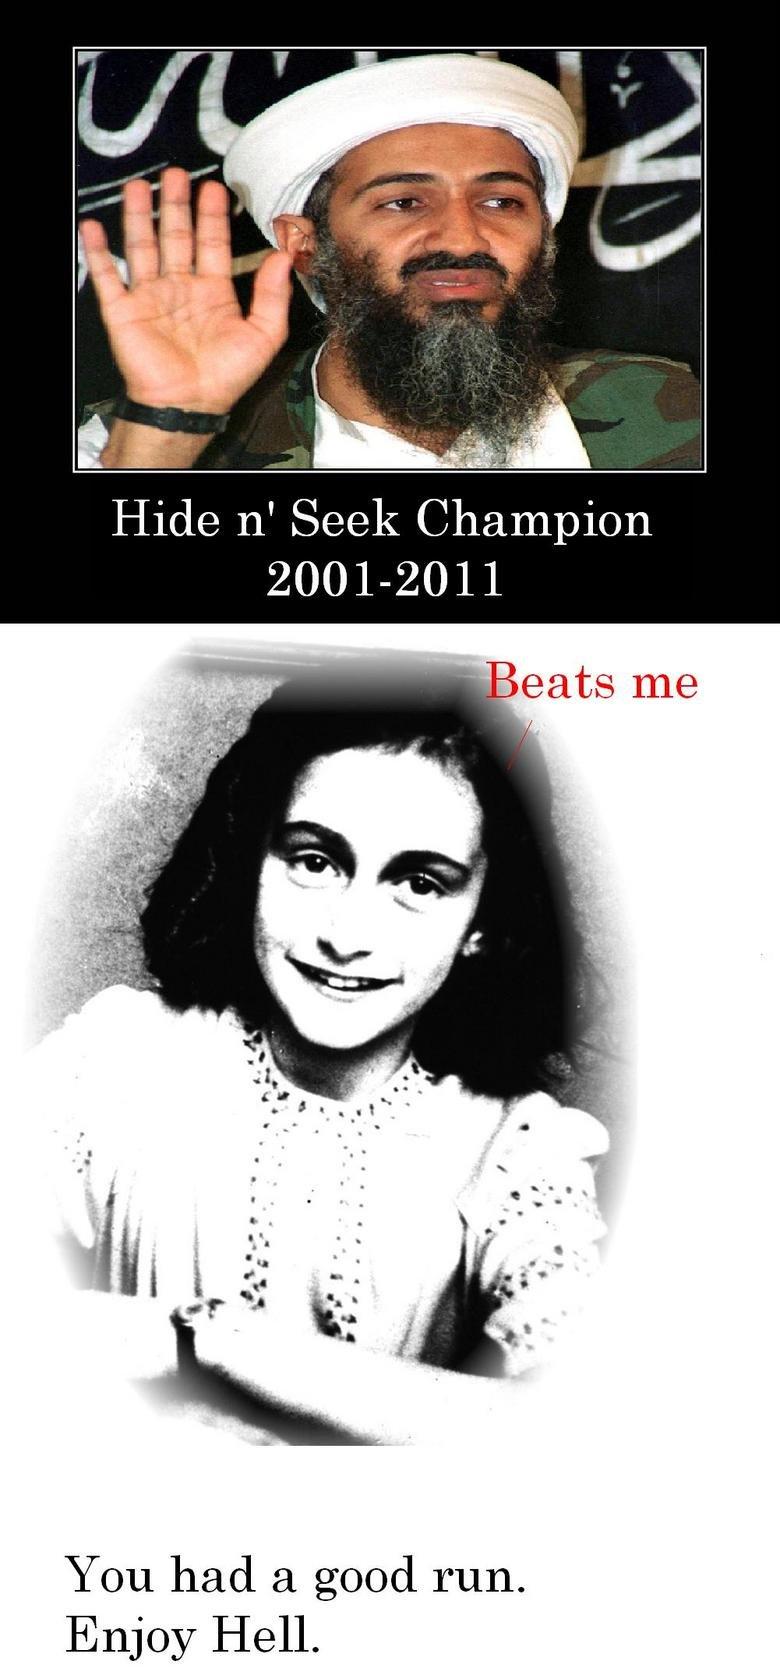 Osama Bin Laden. c u there. Hide If Seek Champion You had a good run. Enjoy Hell.